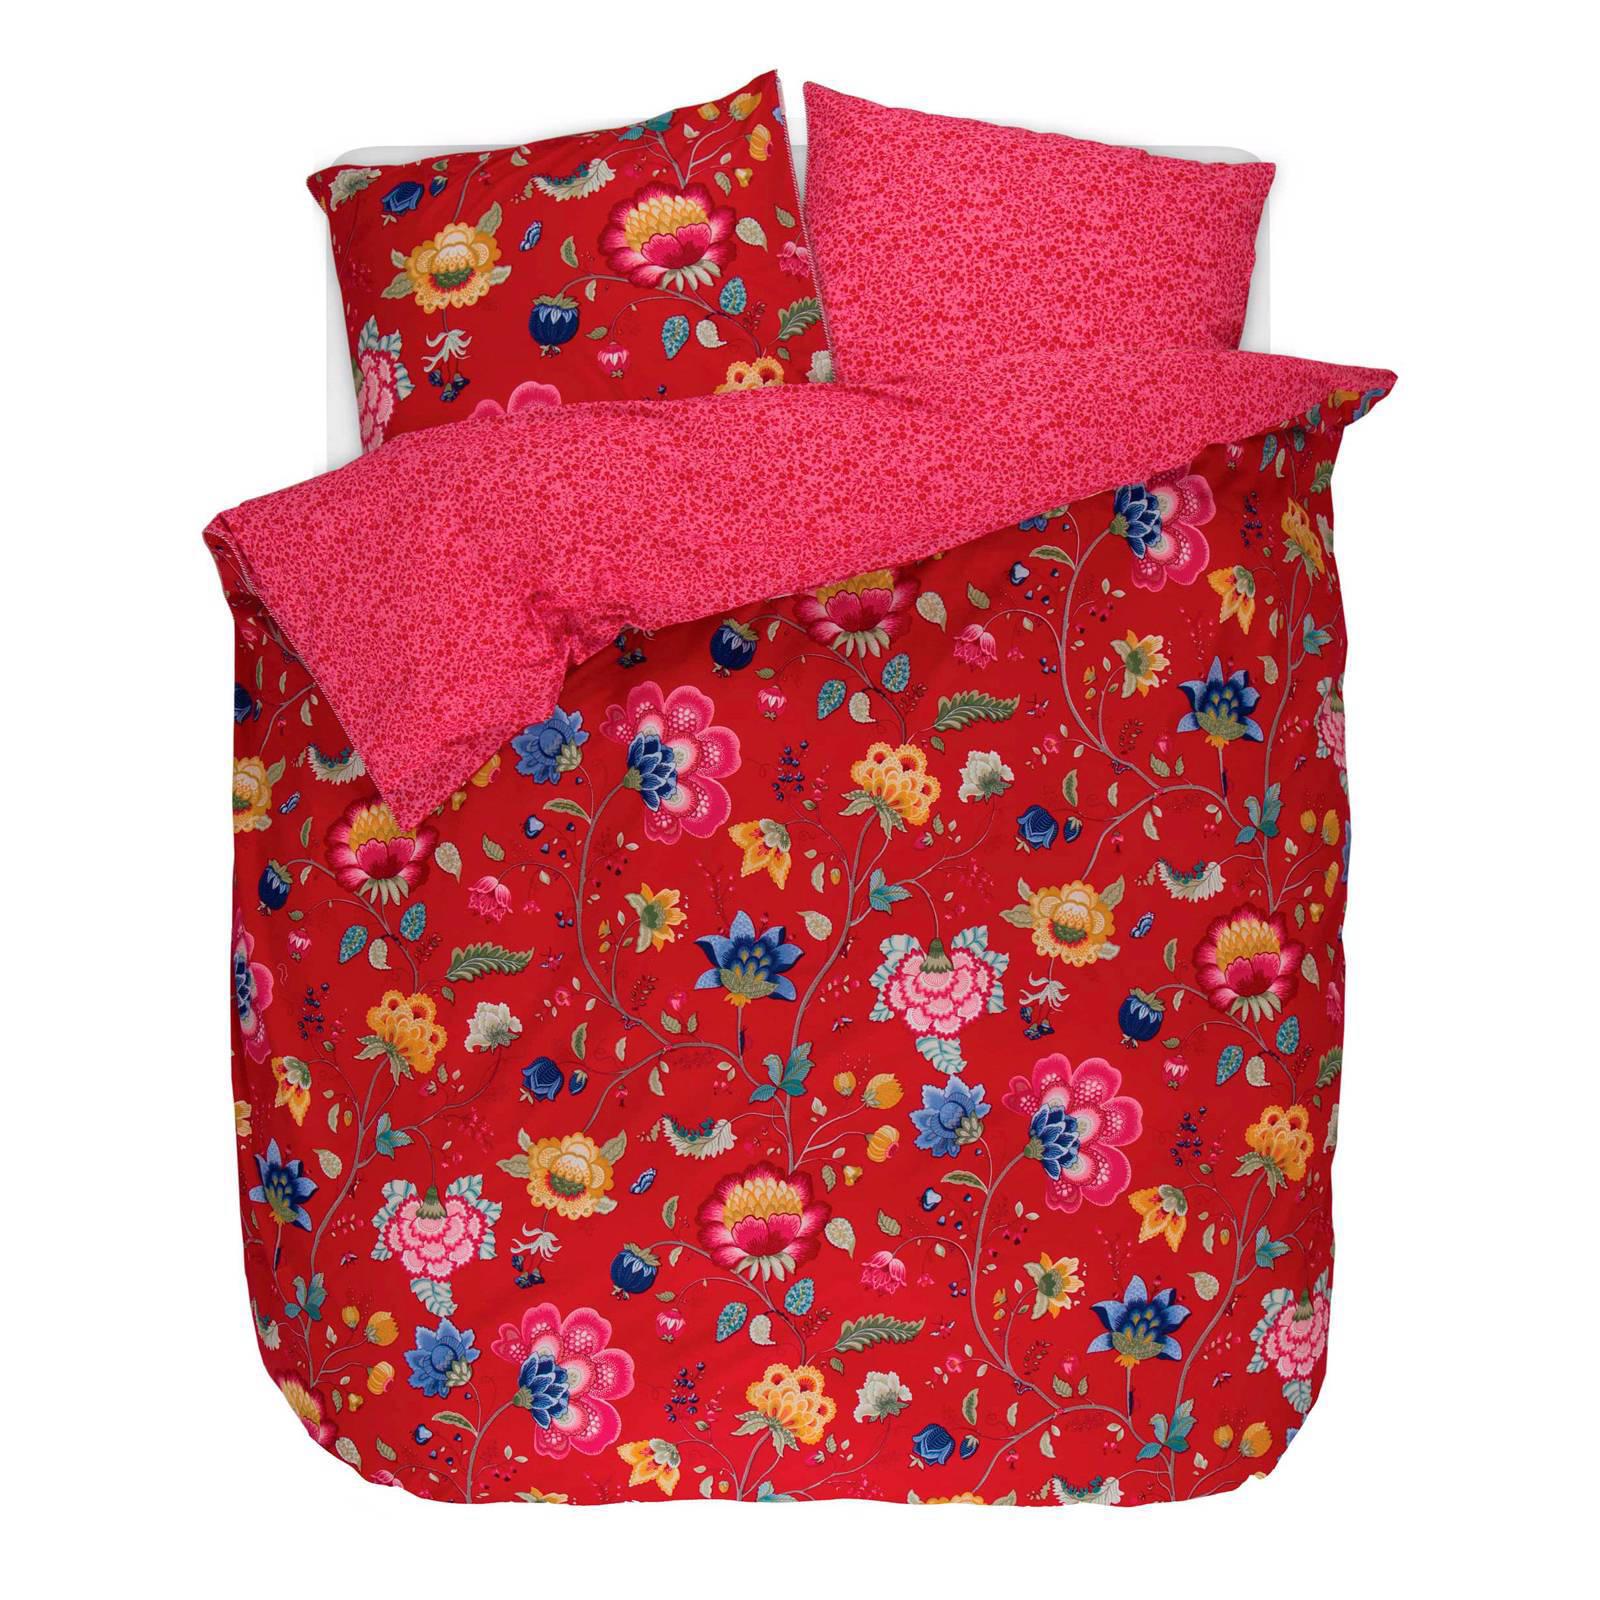 pip studio perkalkatoenen dekbedovertrek lits jumeaux rood